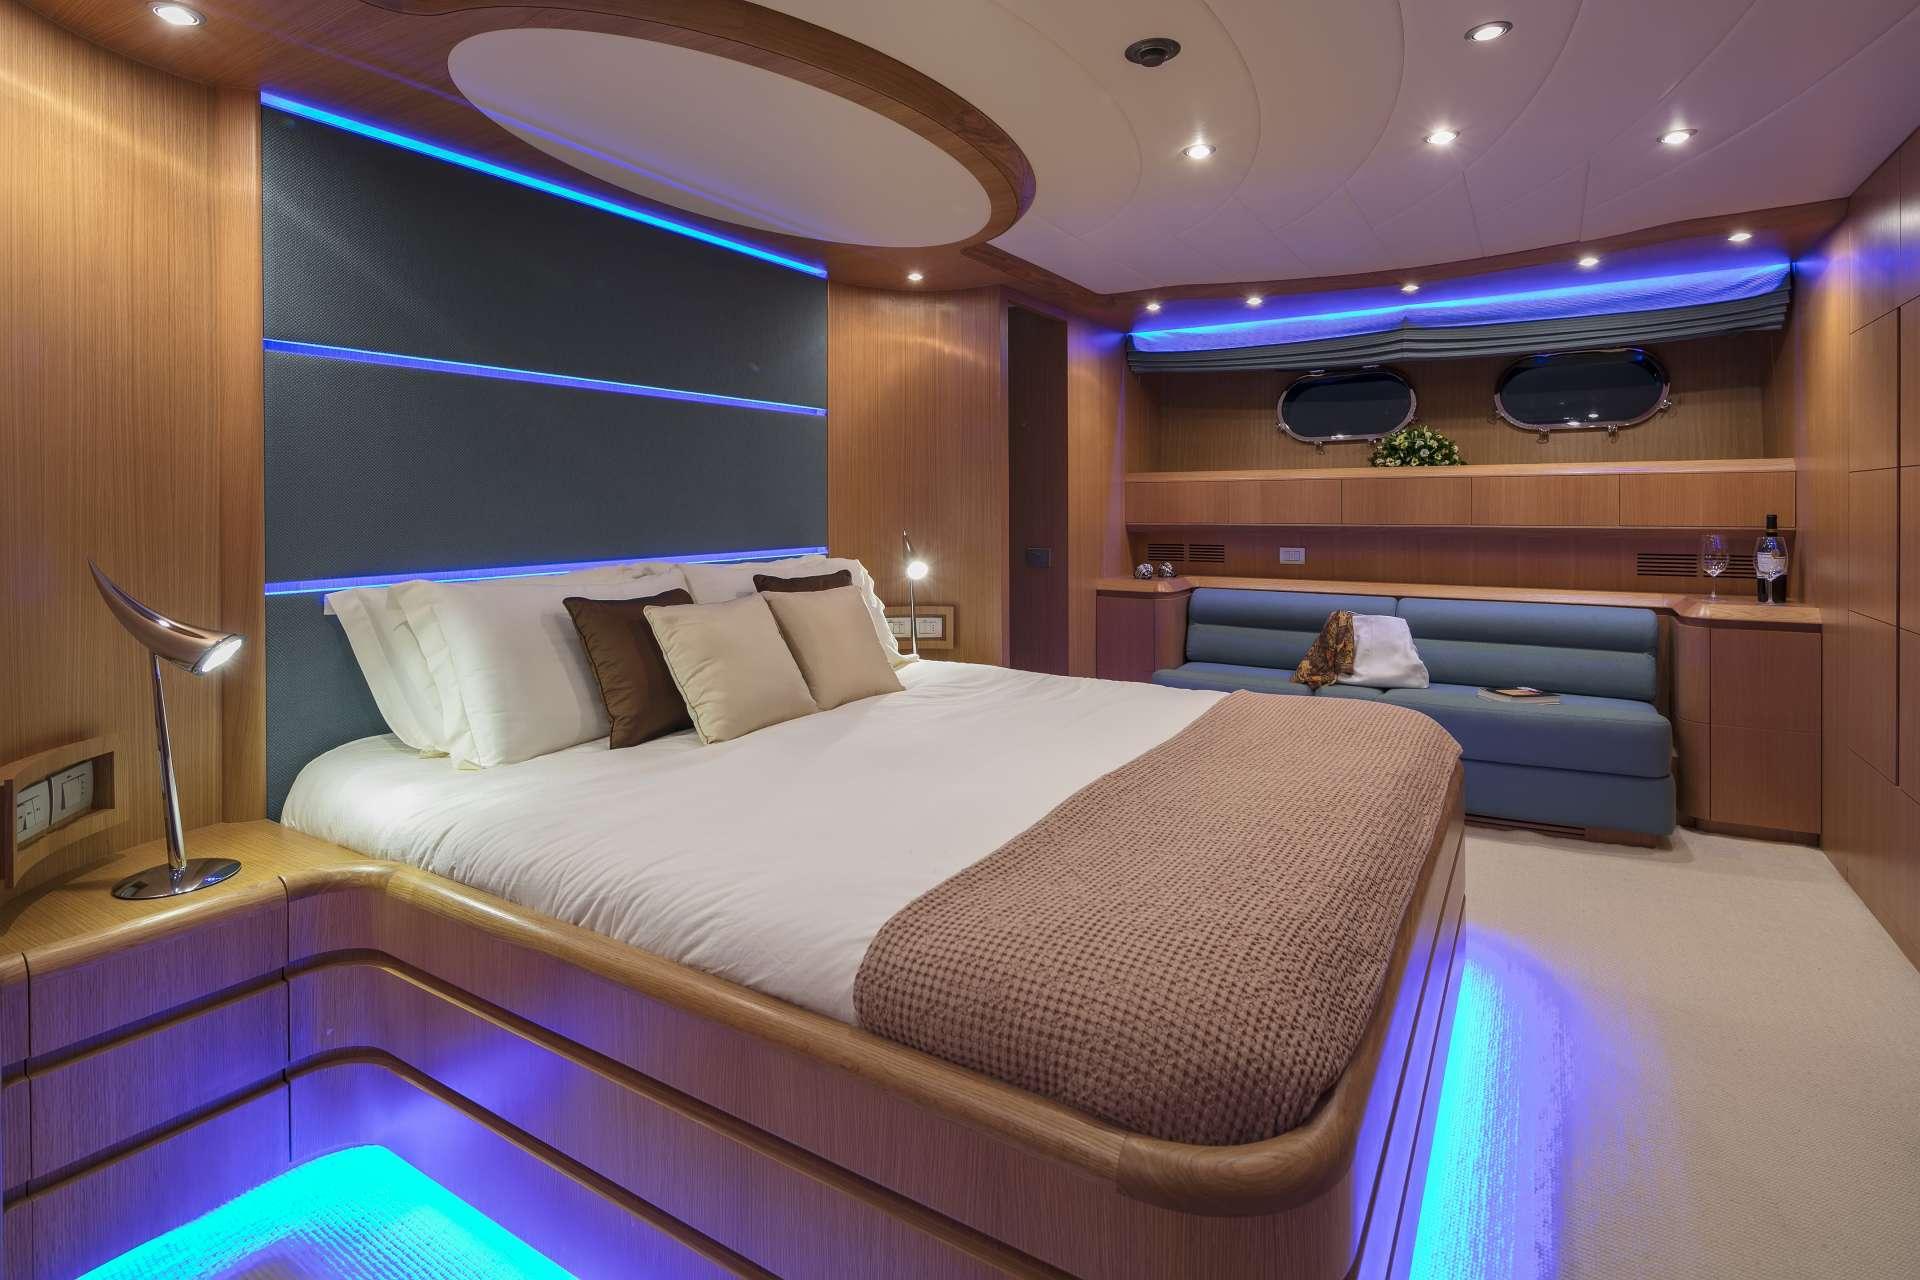 Motor Yacht 'PARIS A' VIP Suite 2, 12 PAX, 6 Crew, 115.00 Ft, 35.06 Meters, Built 2009, Majora, Refit Year 2013